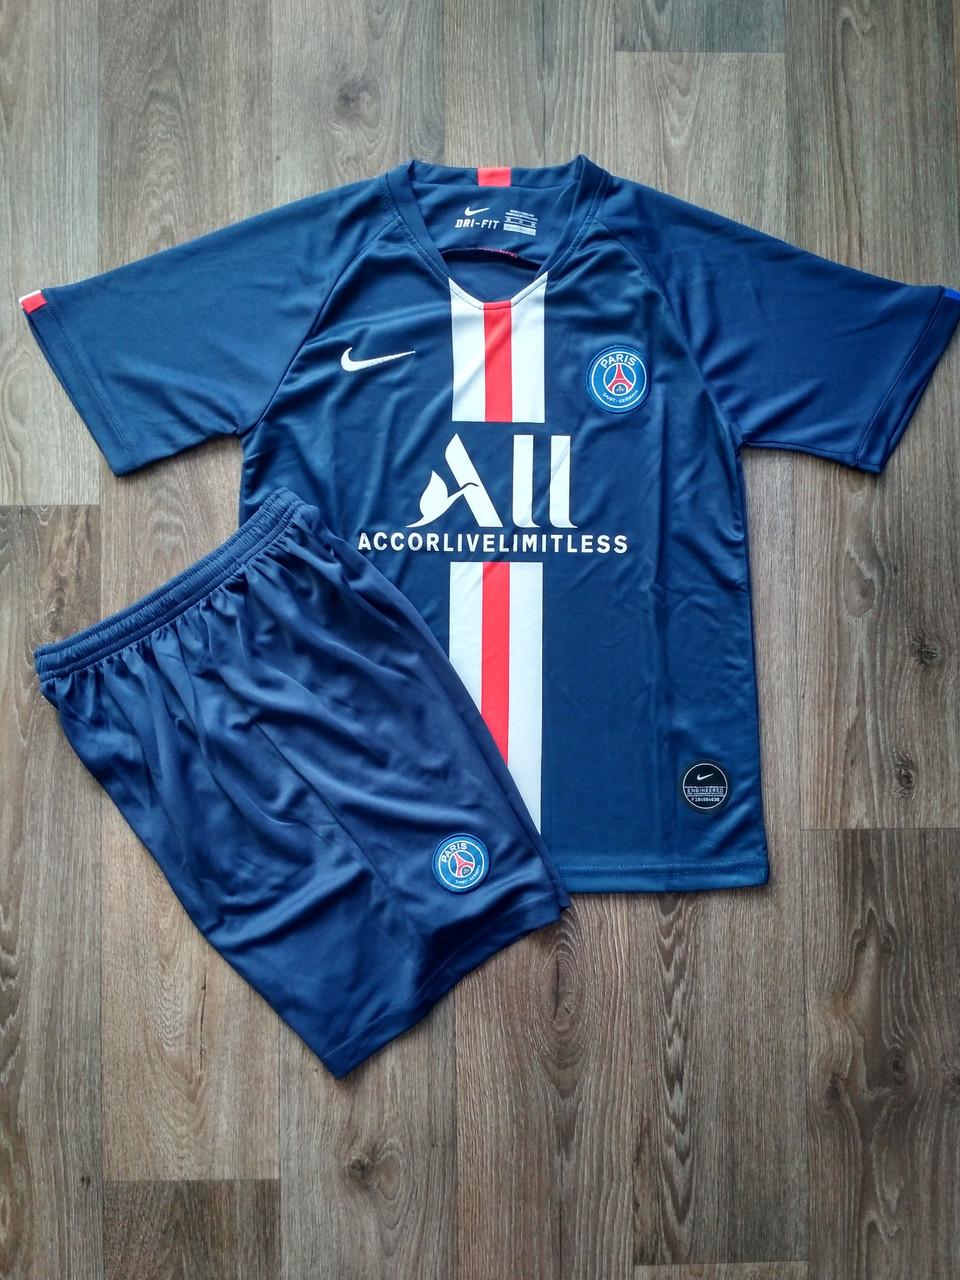 Футбольная форма ПСЖ/PSG ( Франция, Лига 1 ), домашняя, сезон 2019-2020